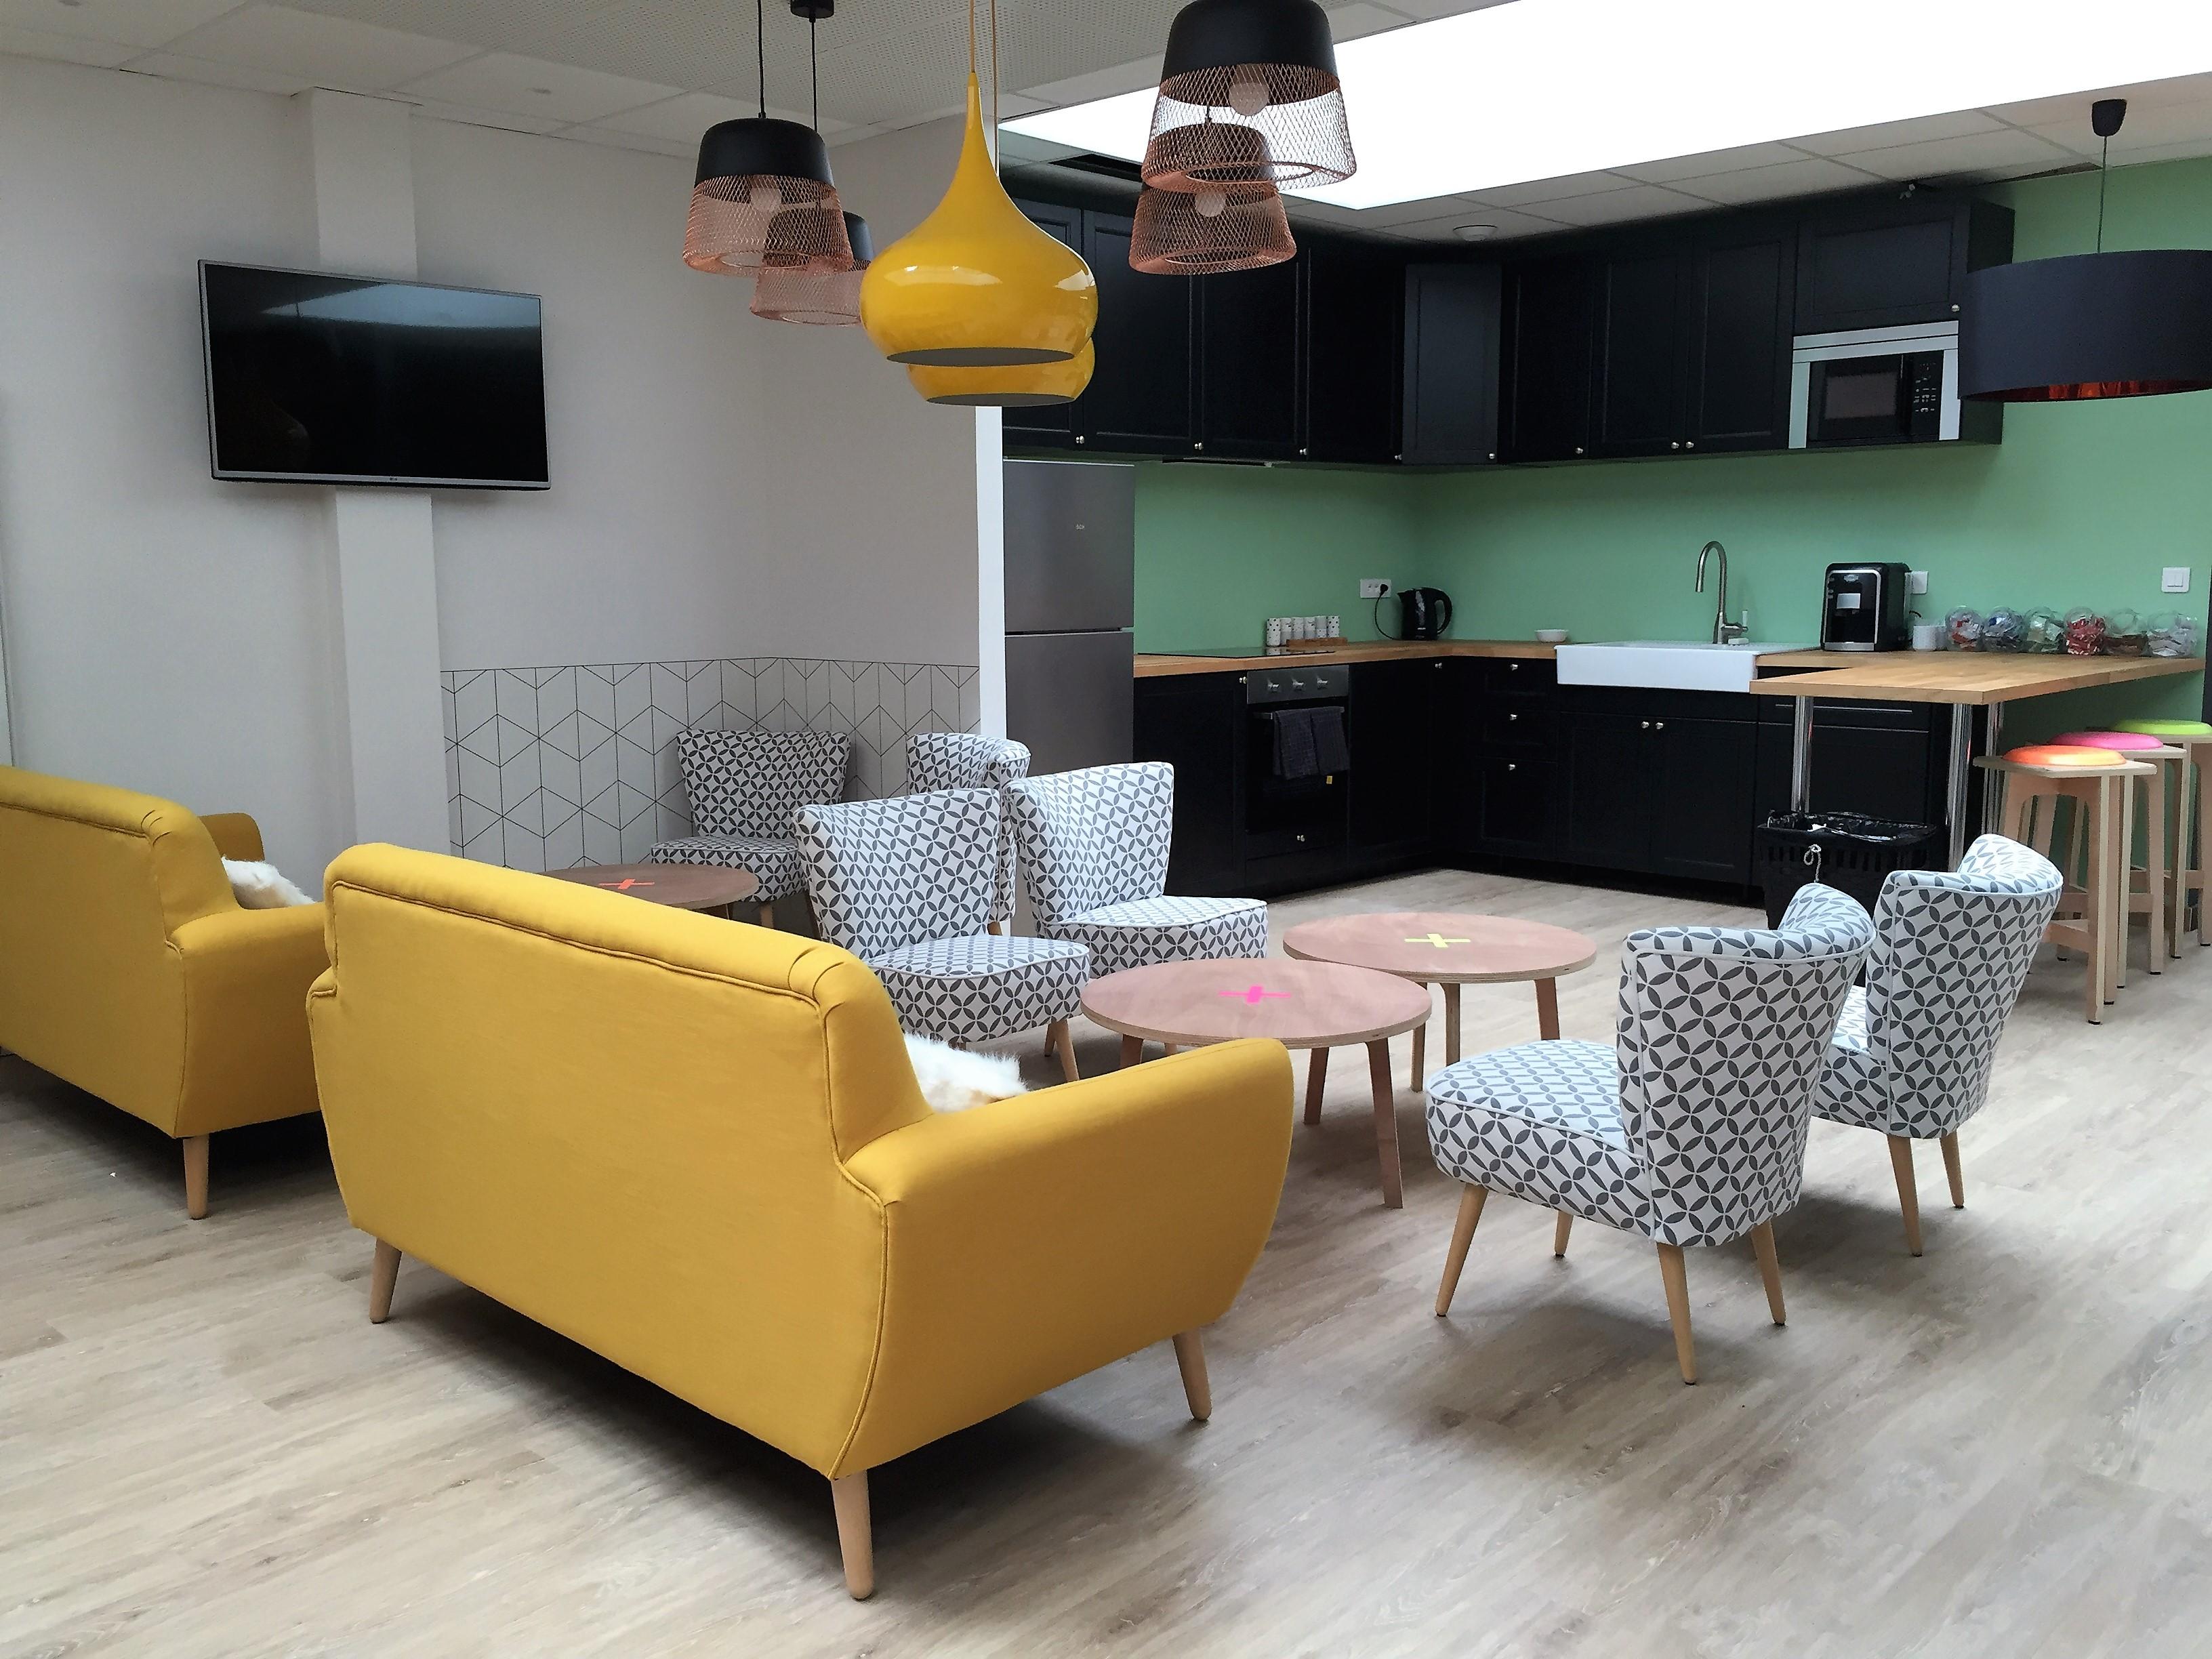 Le loft coworking espace lounge - Idee deco lounge design ...